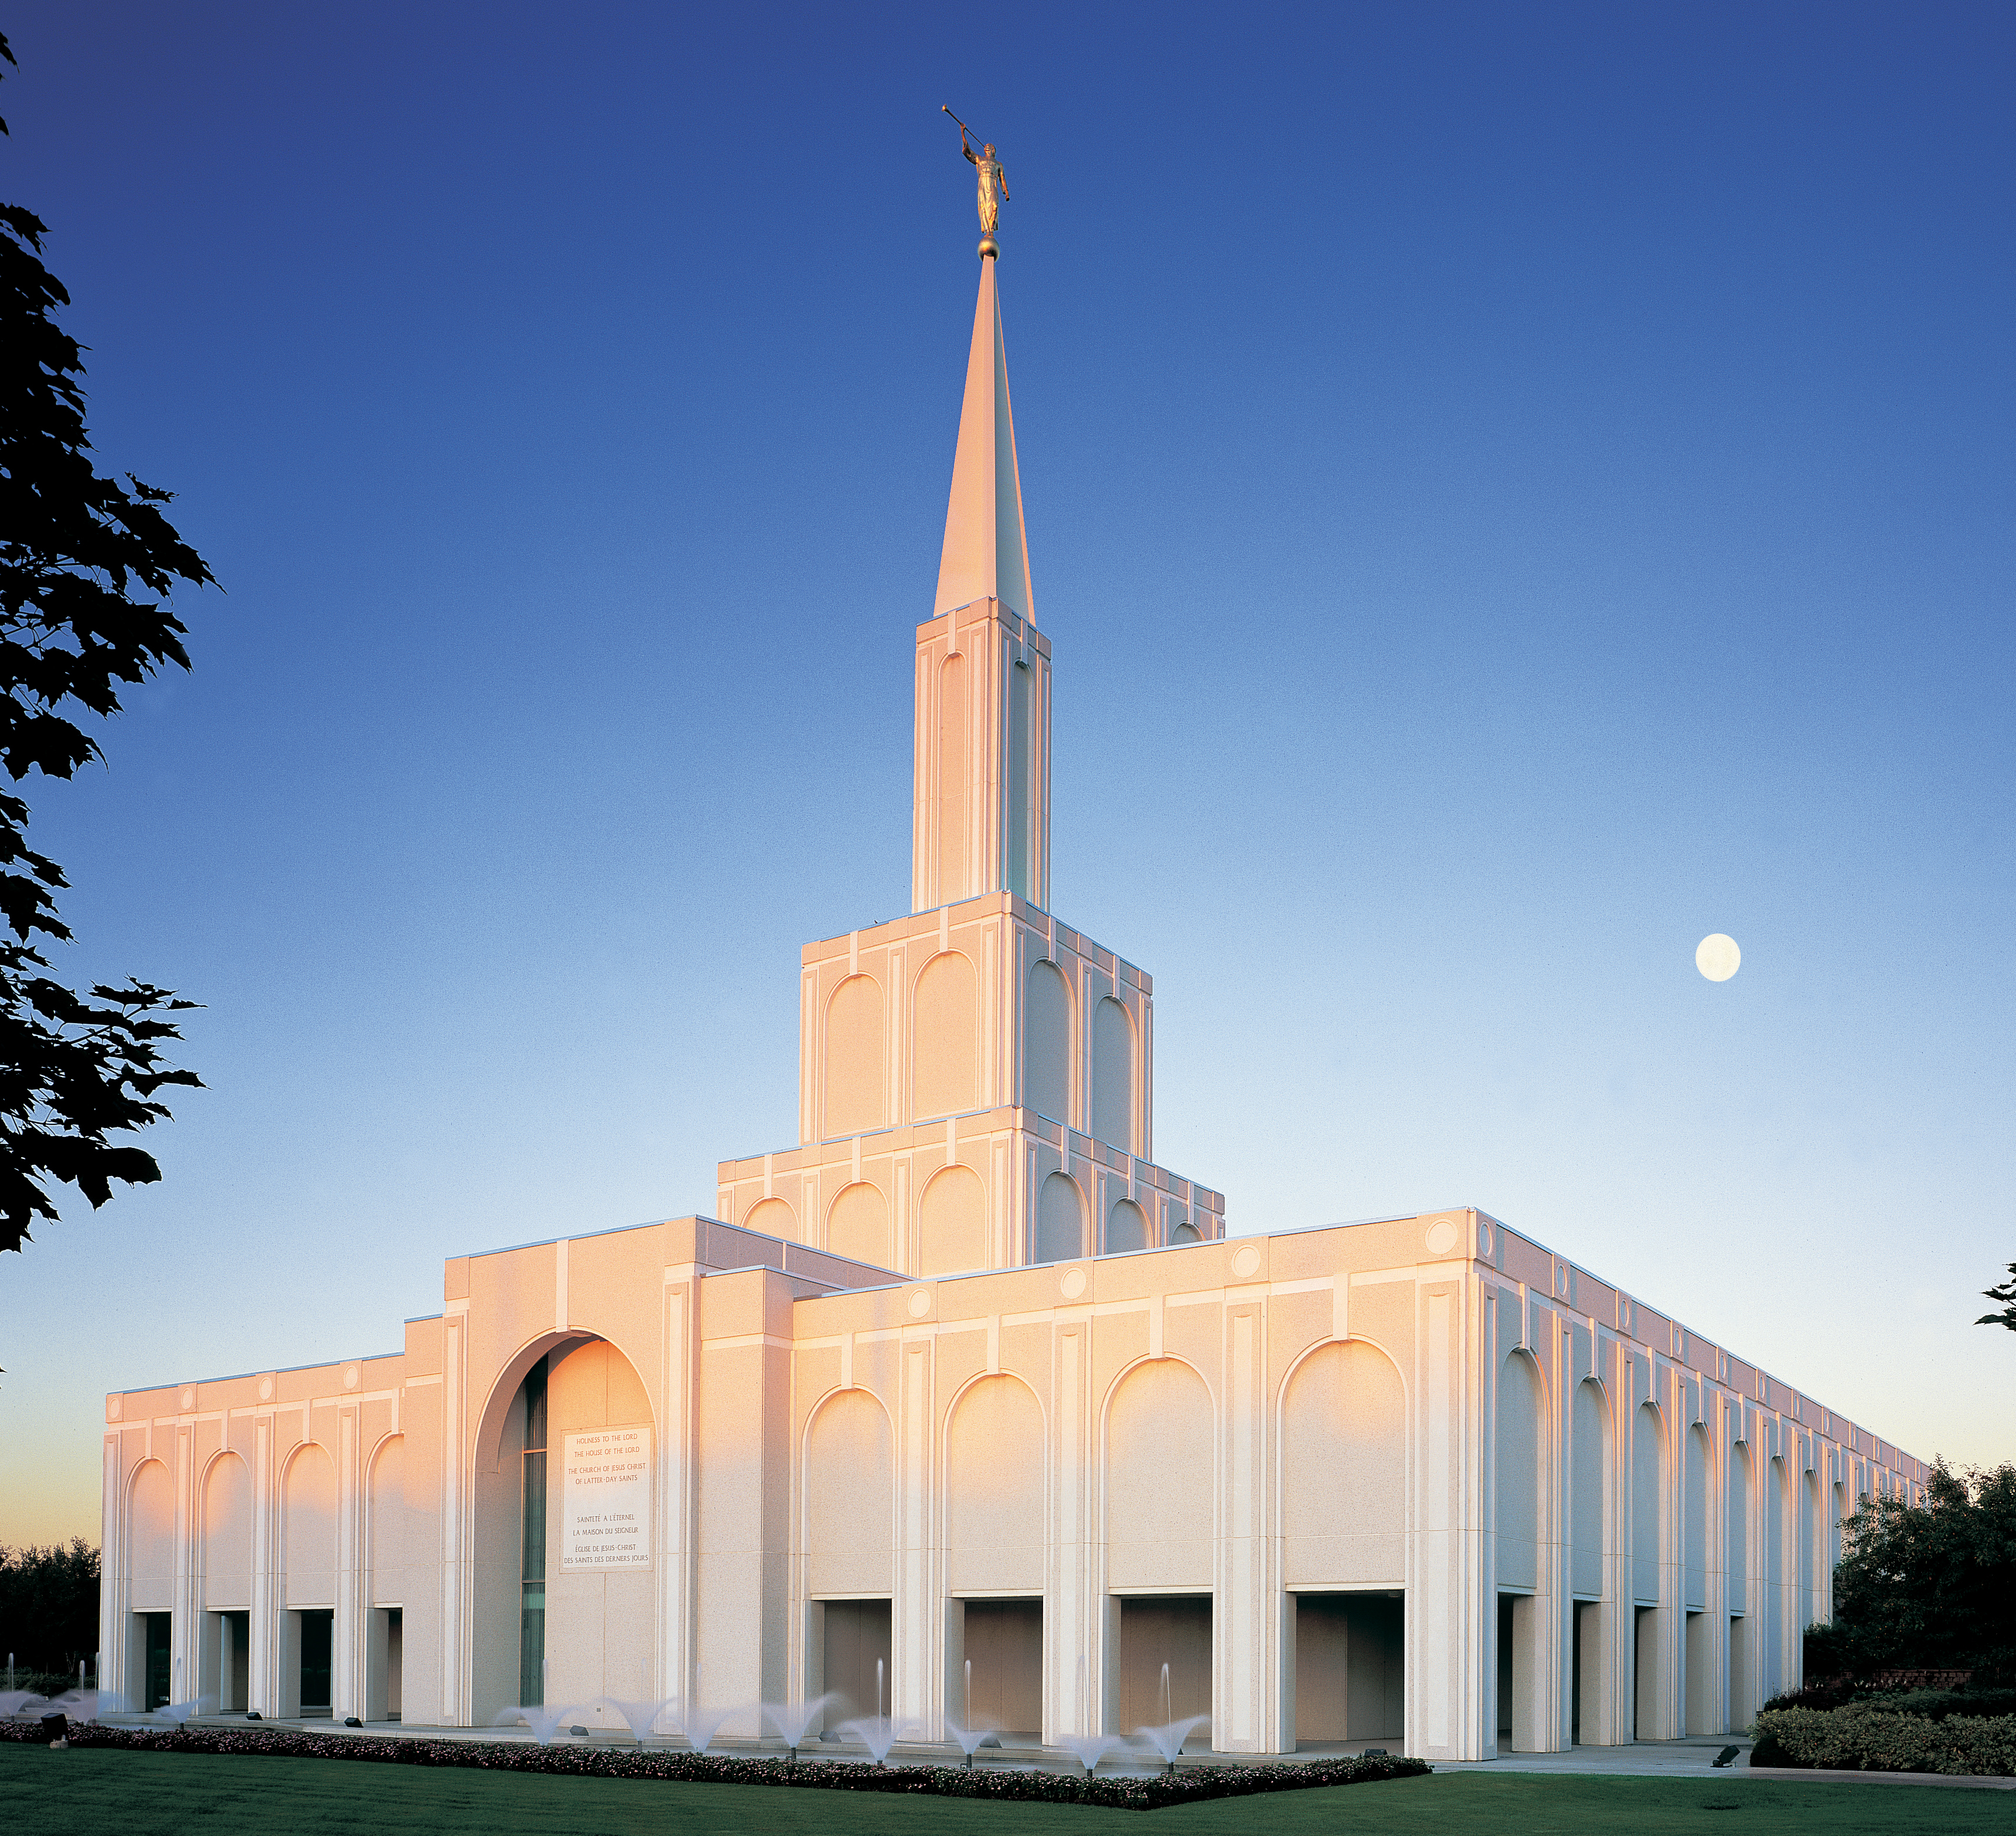 Mormon dating site canada